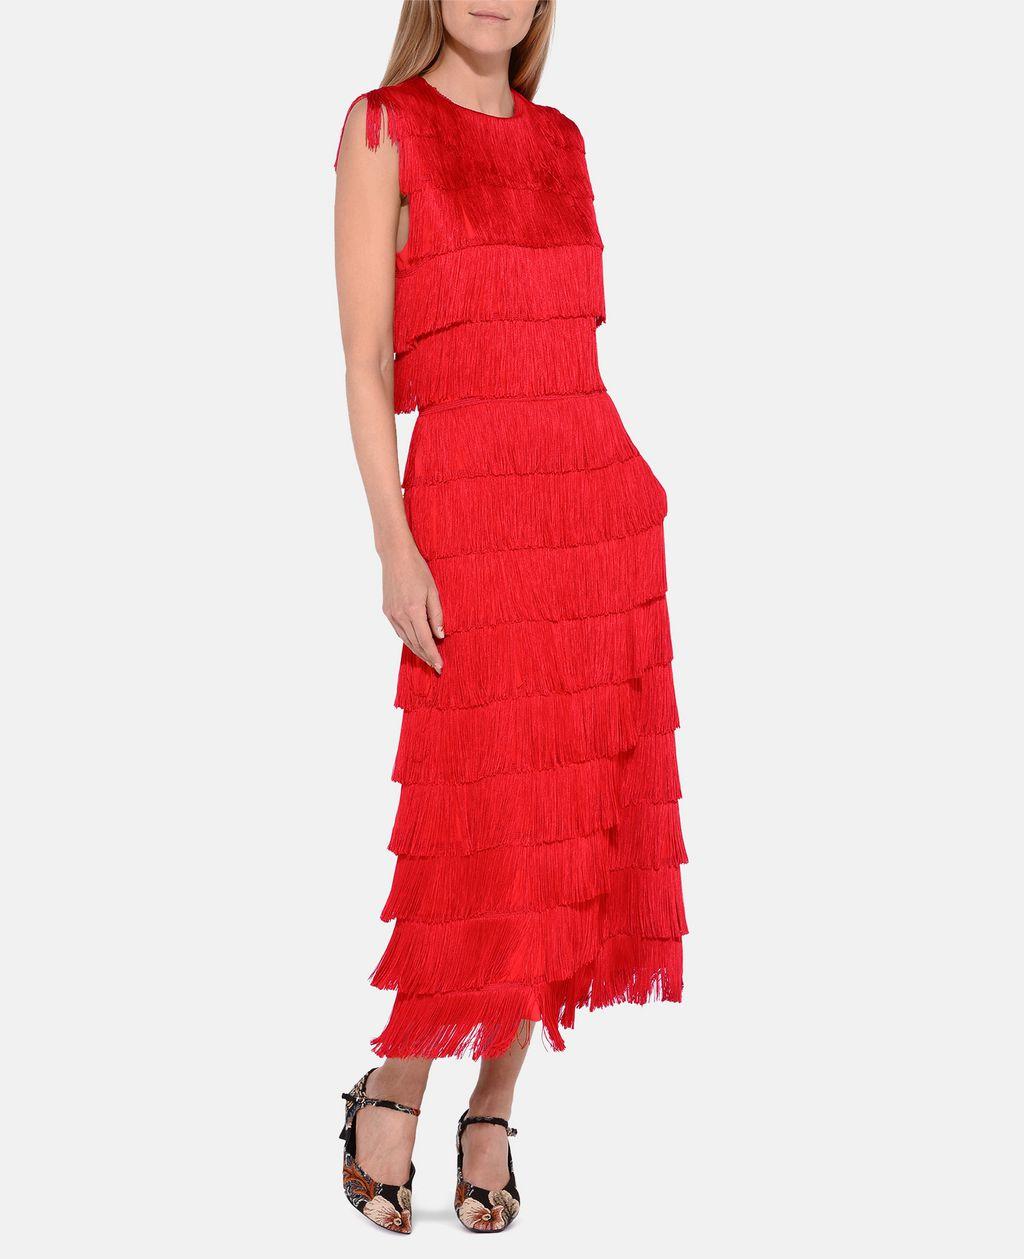 b22792d0ee6 Red Stella Mccartney Dresses